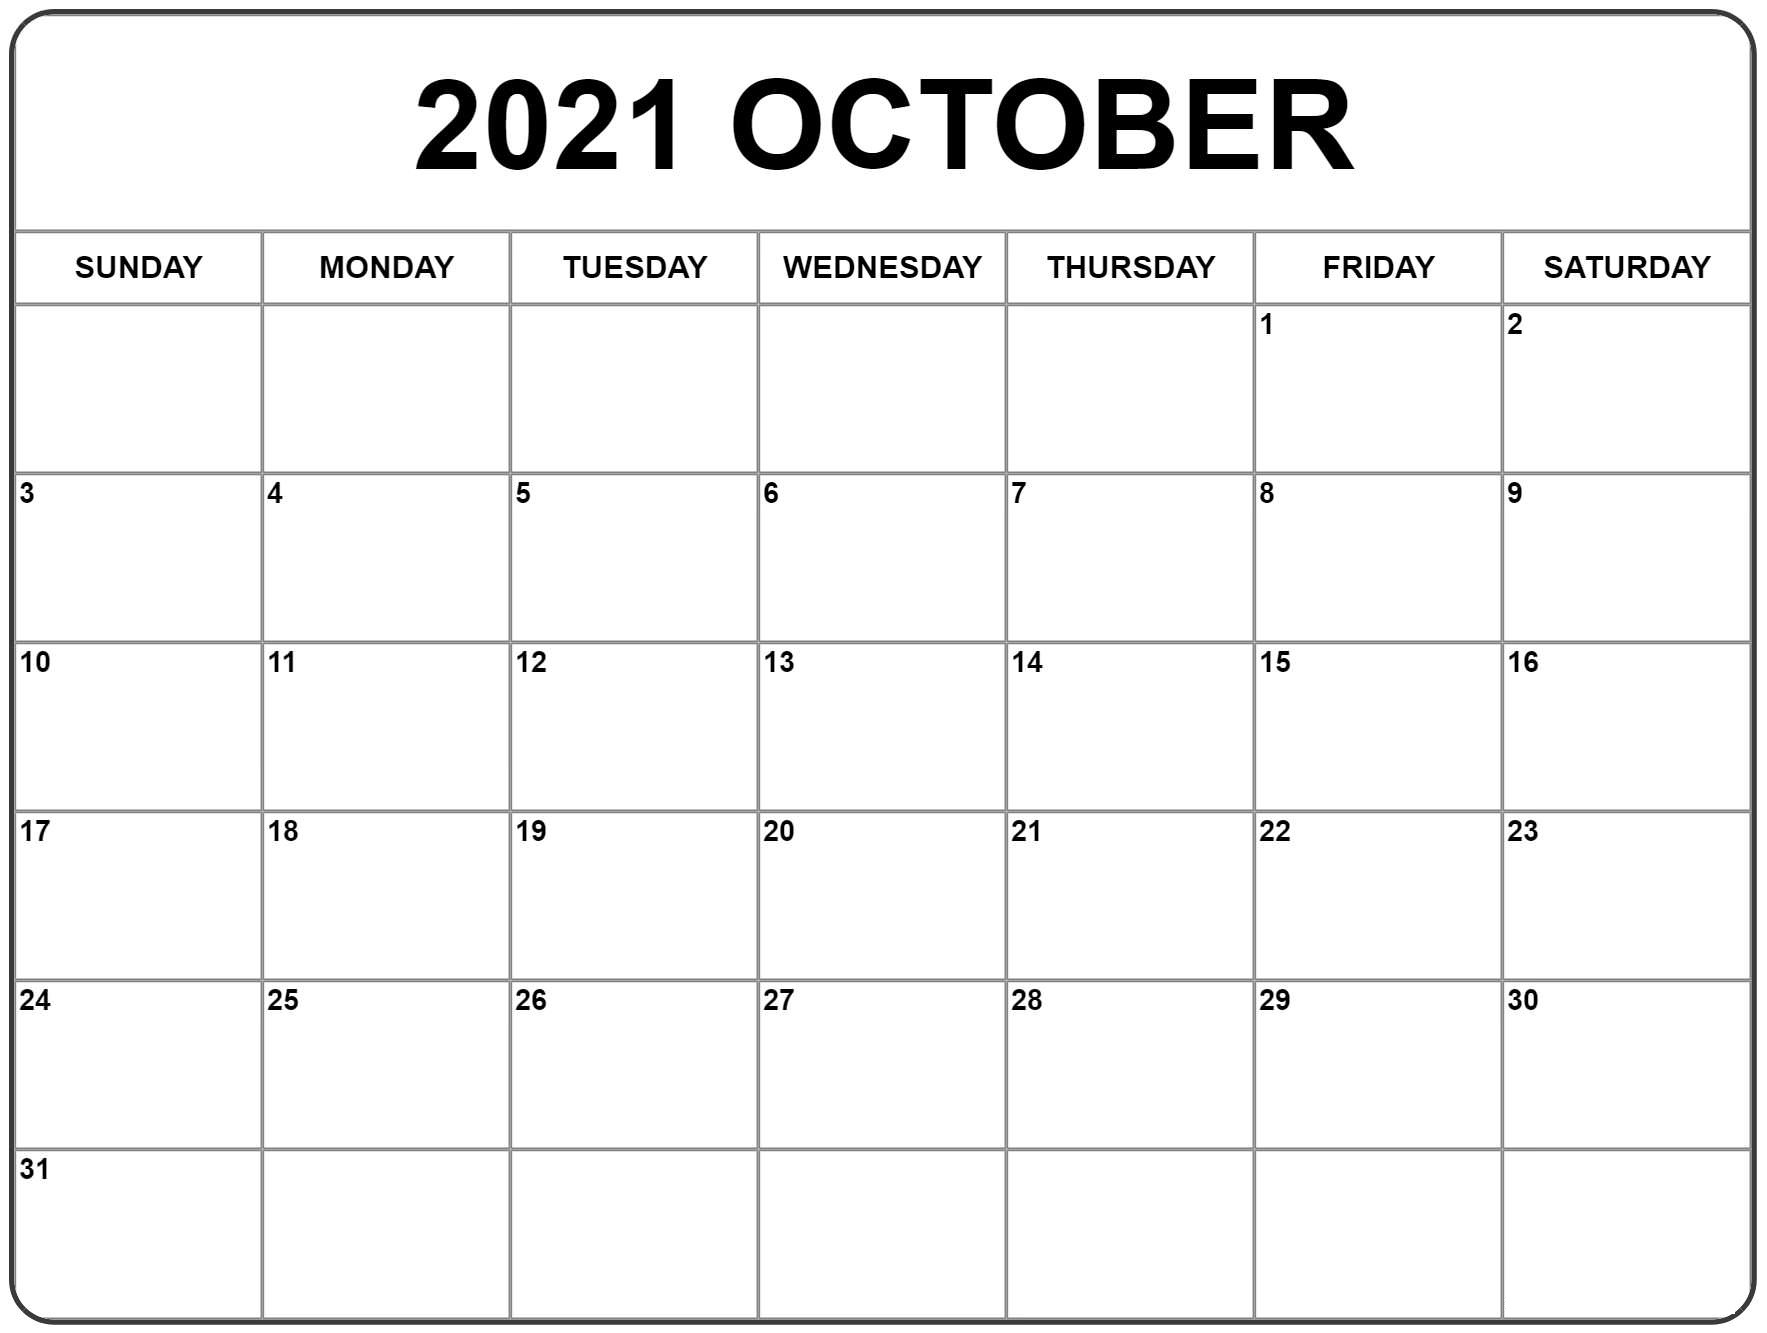 October 2021 Blank Calendar Printable Wiki